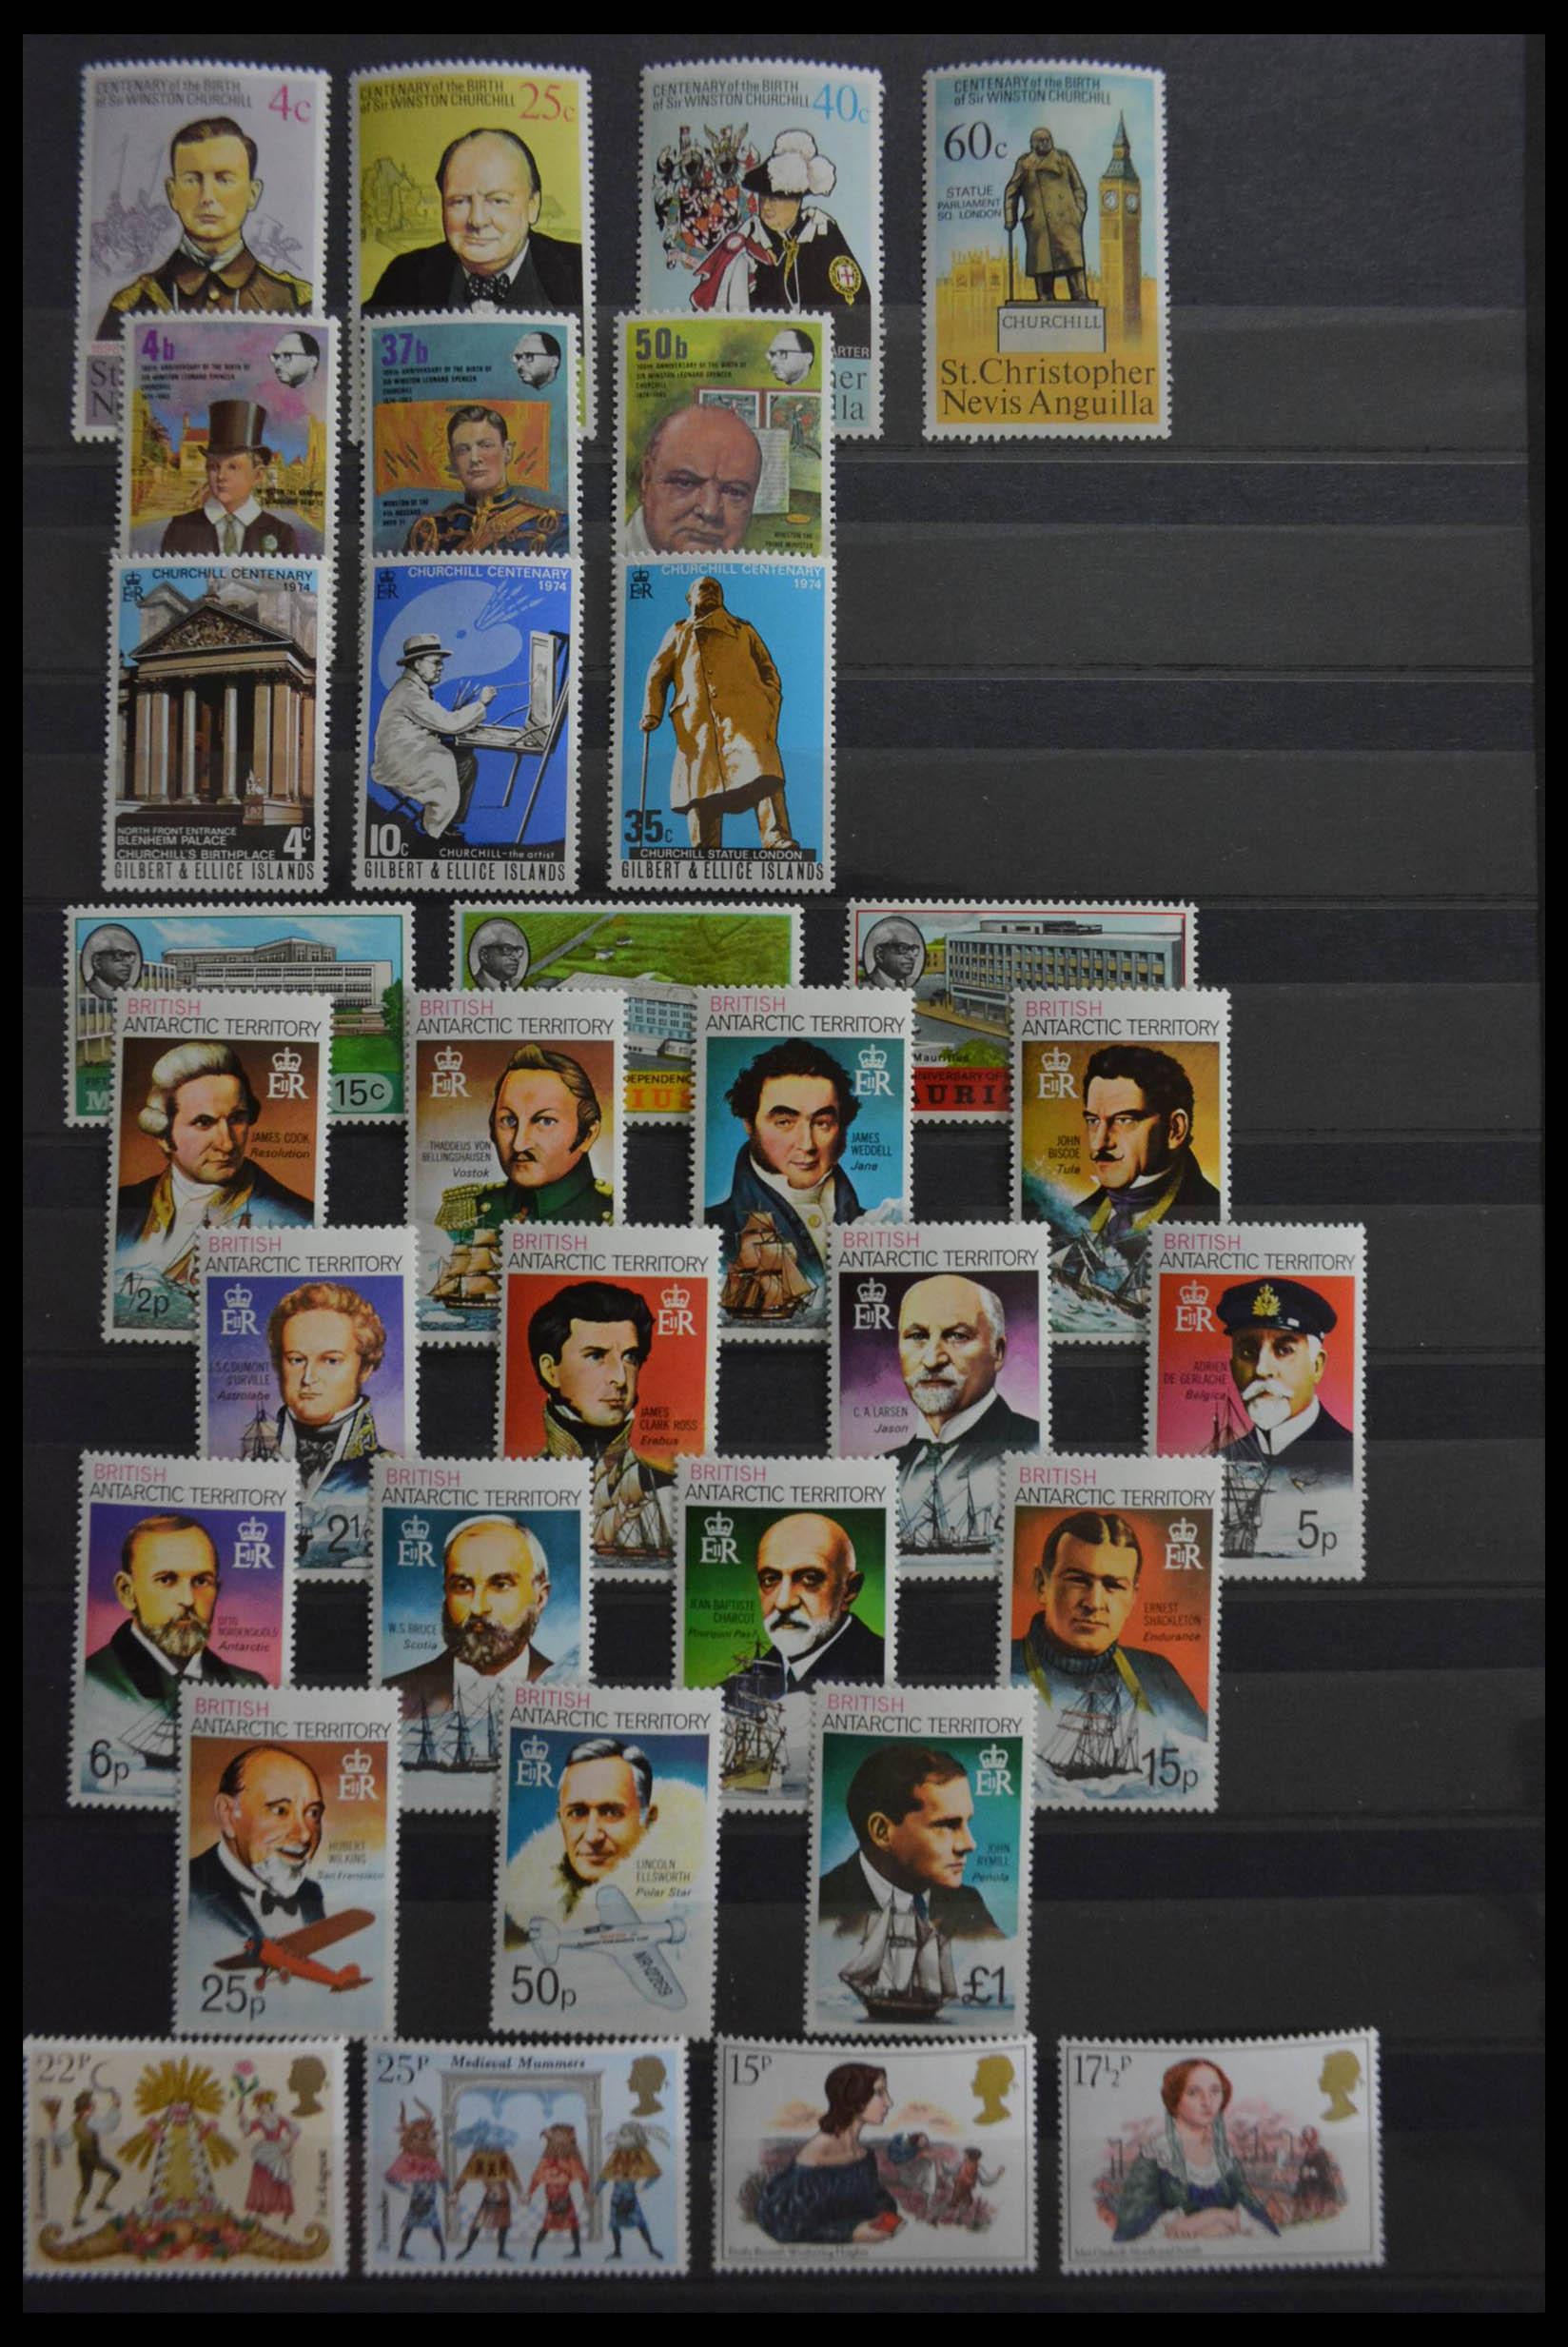 28512 003 - Postzegelverzameling 28512 Britse Gemenebest postfris.